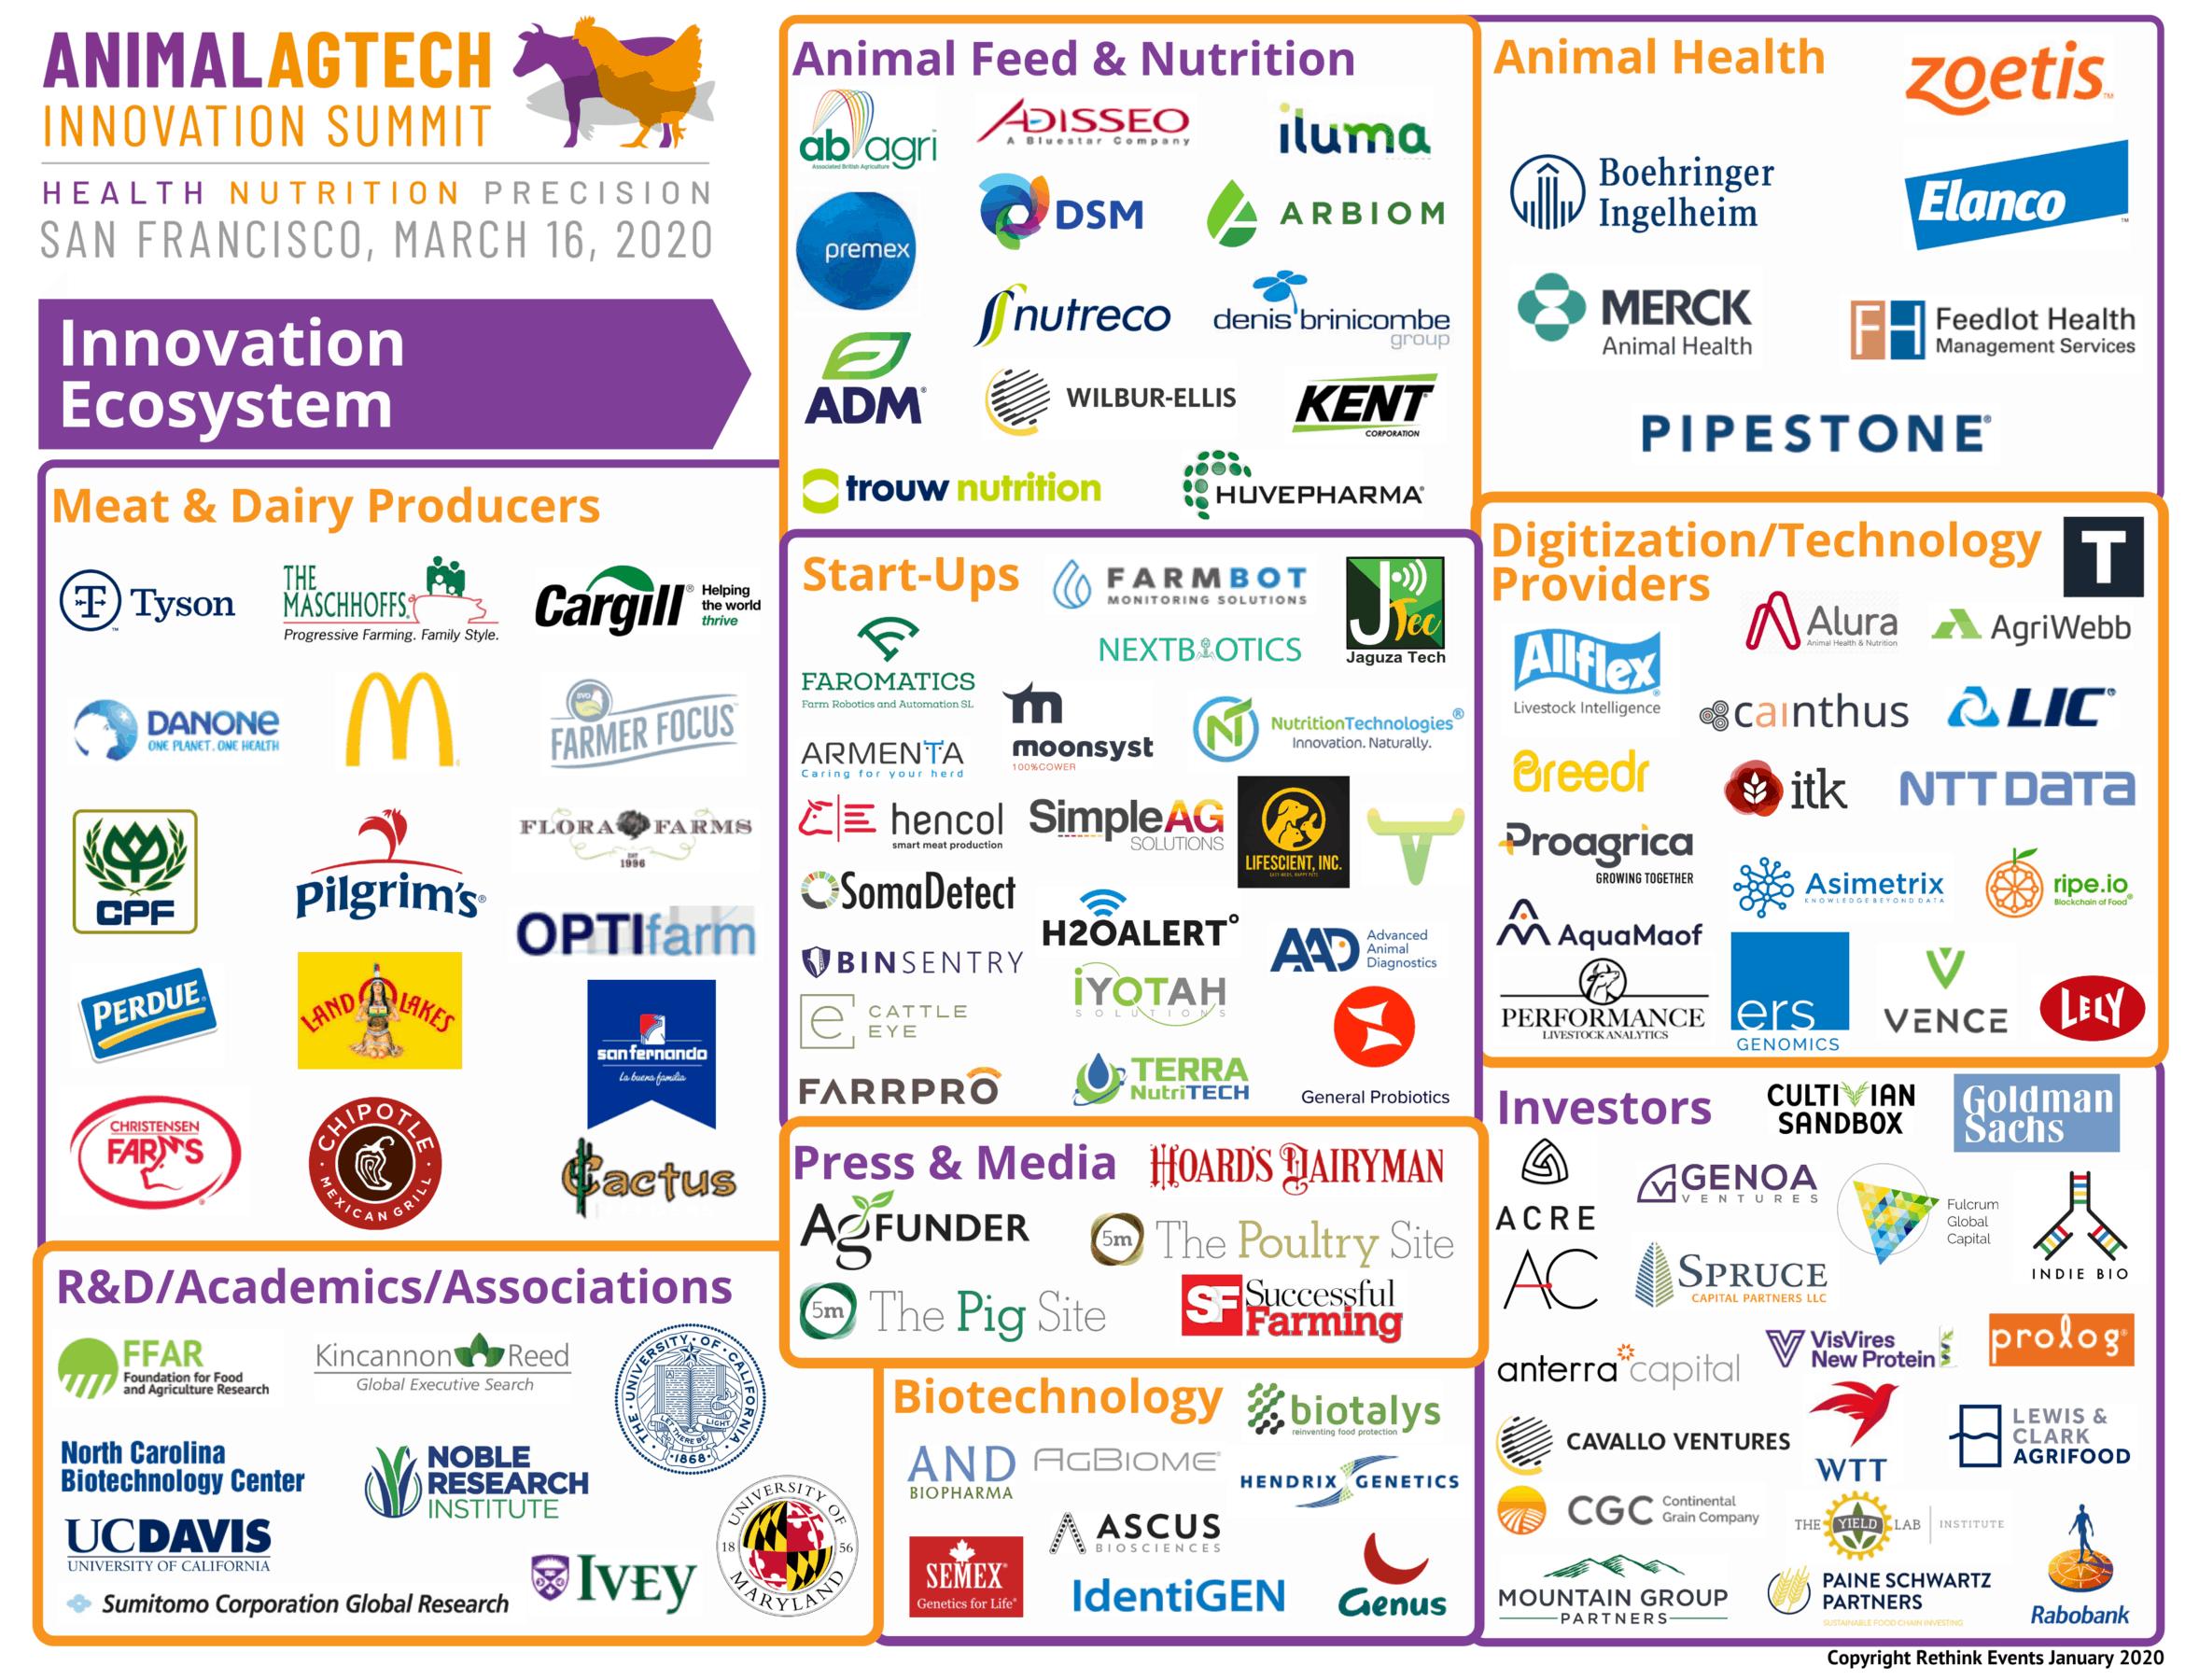 Ecosystem - Animal AgTech Innovation Summit, San Francisco